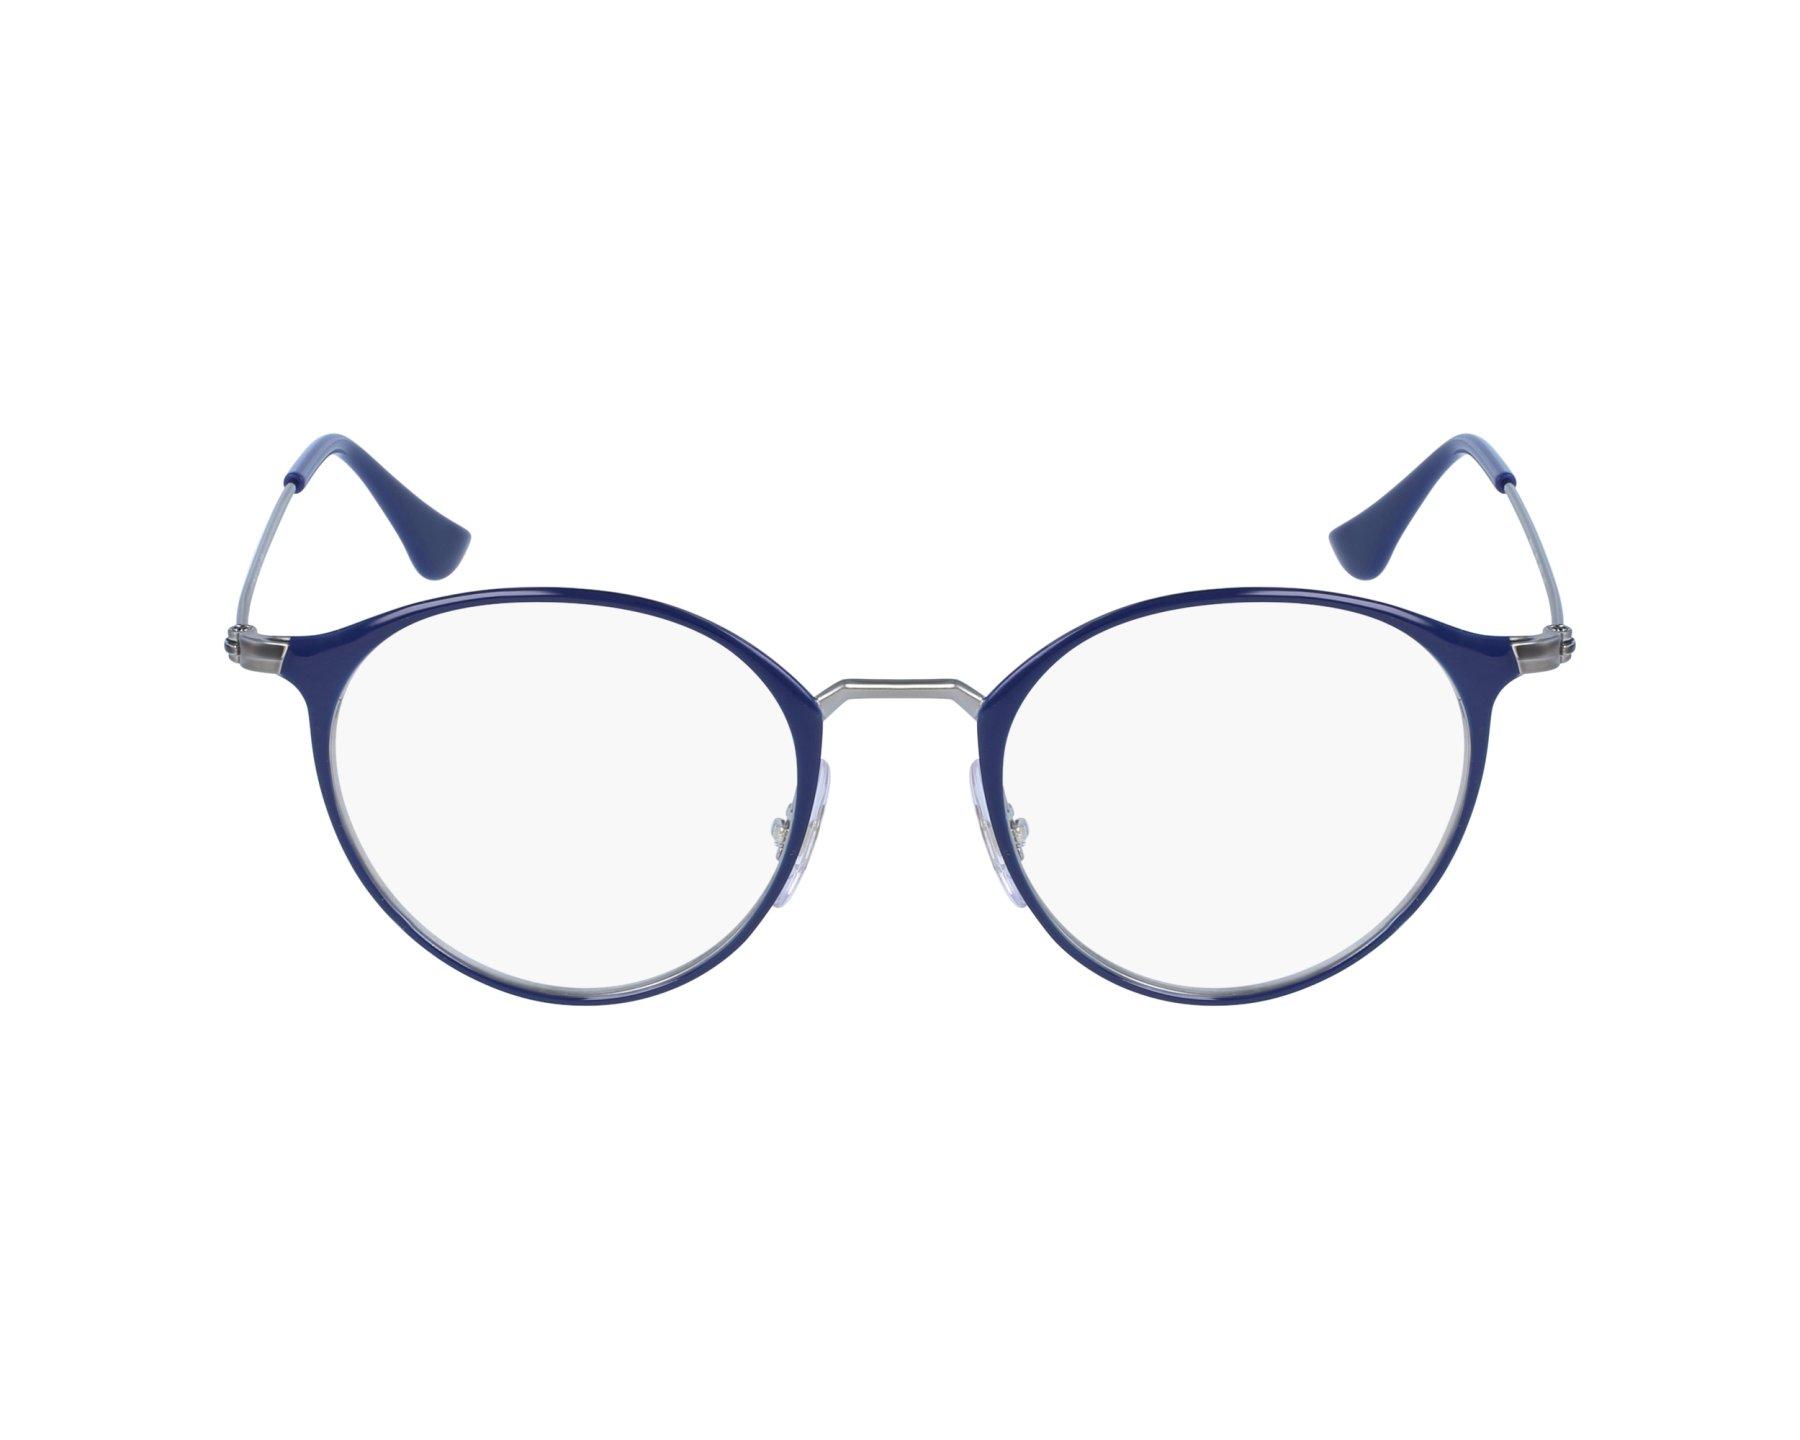 eyeglasses Ray-Ban RX-6378 2906 47-21 Blue Blue sky profile view 96c5a07a8b44